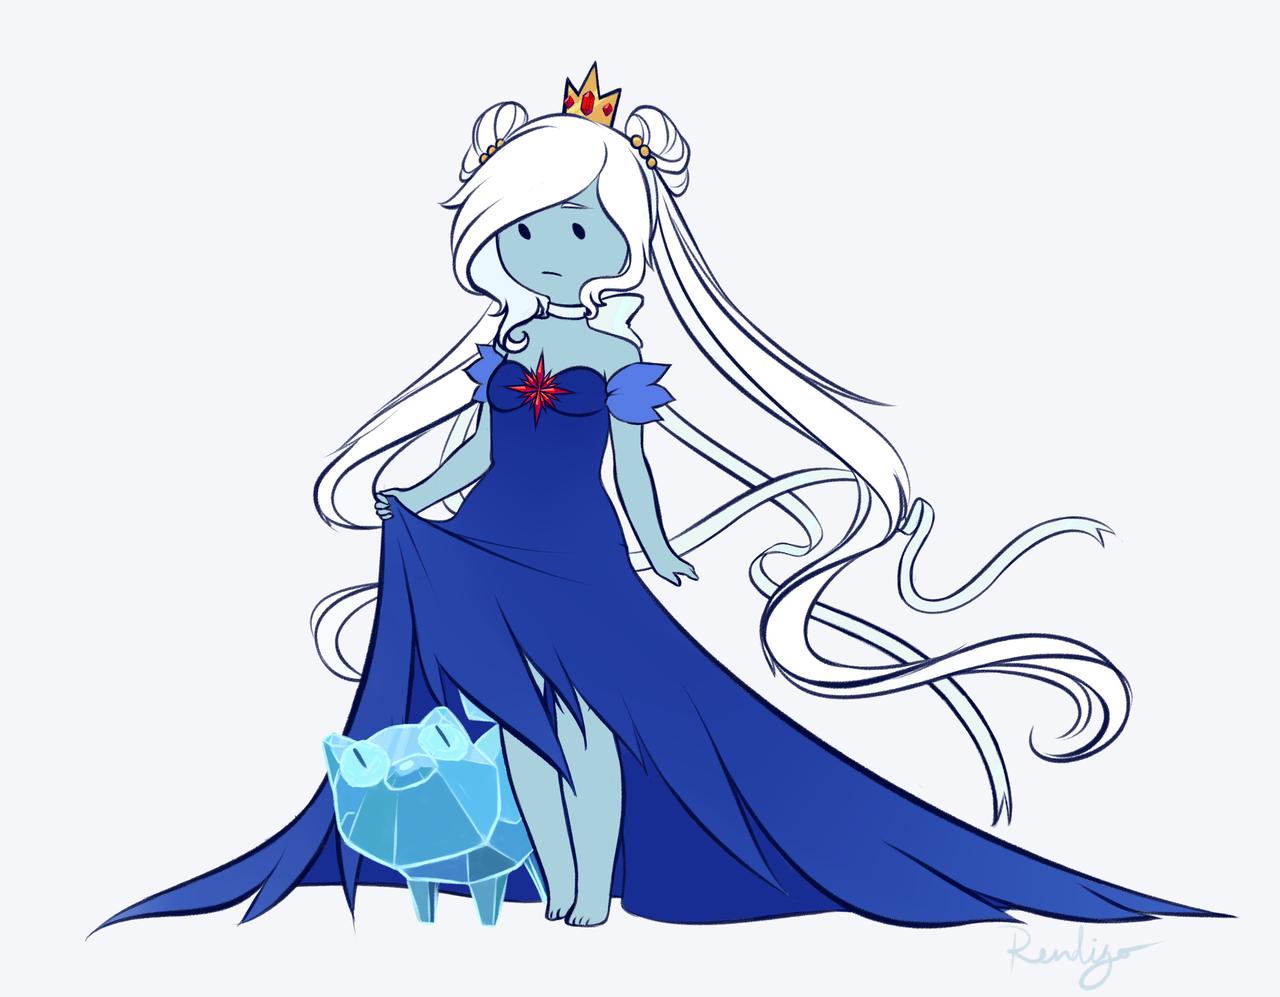 Drawn princess ice princess Multiple Kitten requests I've Kitten